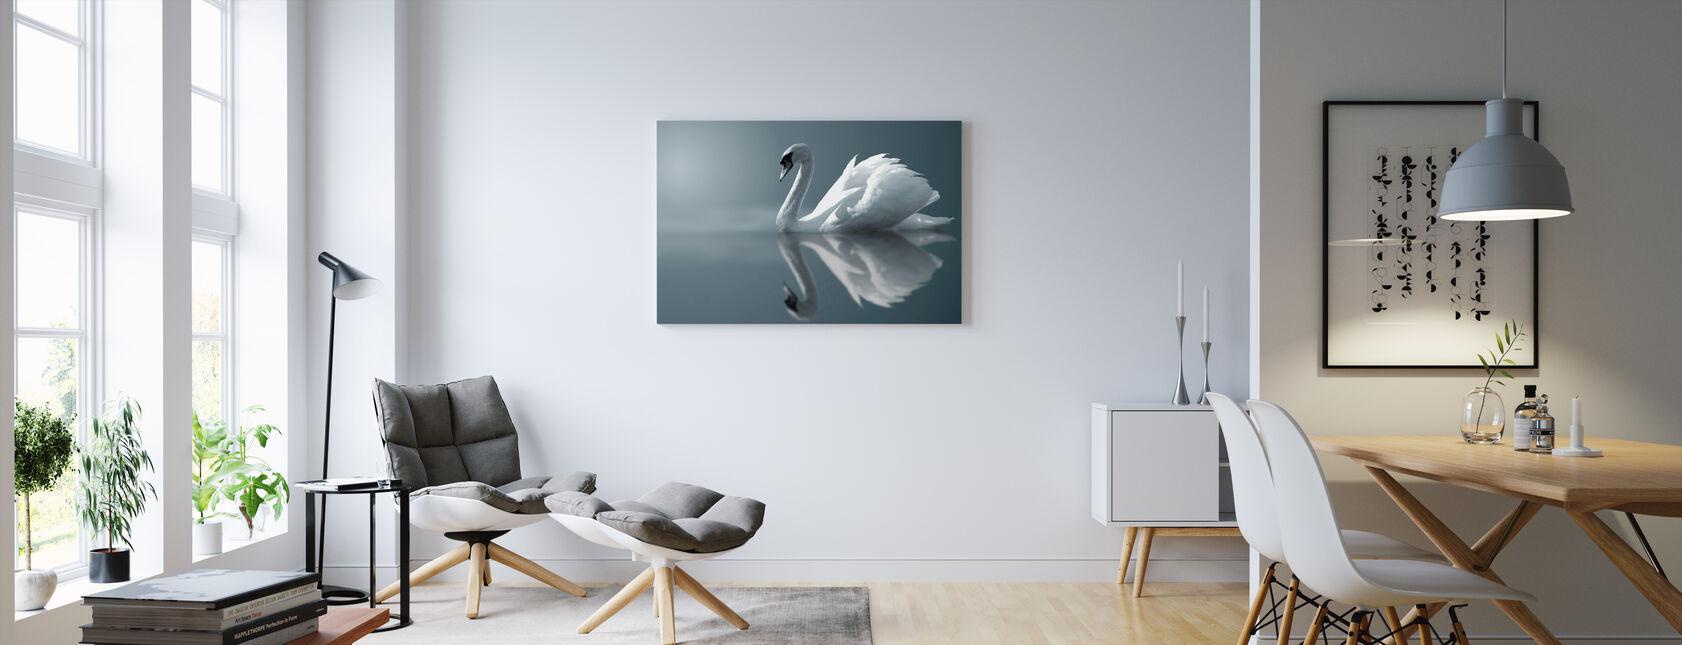 Swan Reflektion - Canvastavla - Vardagsrum